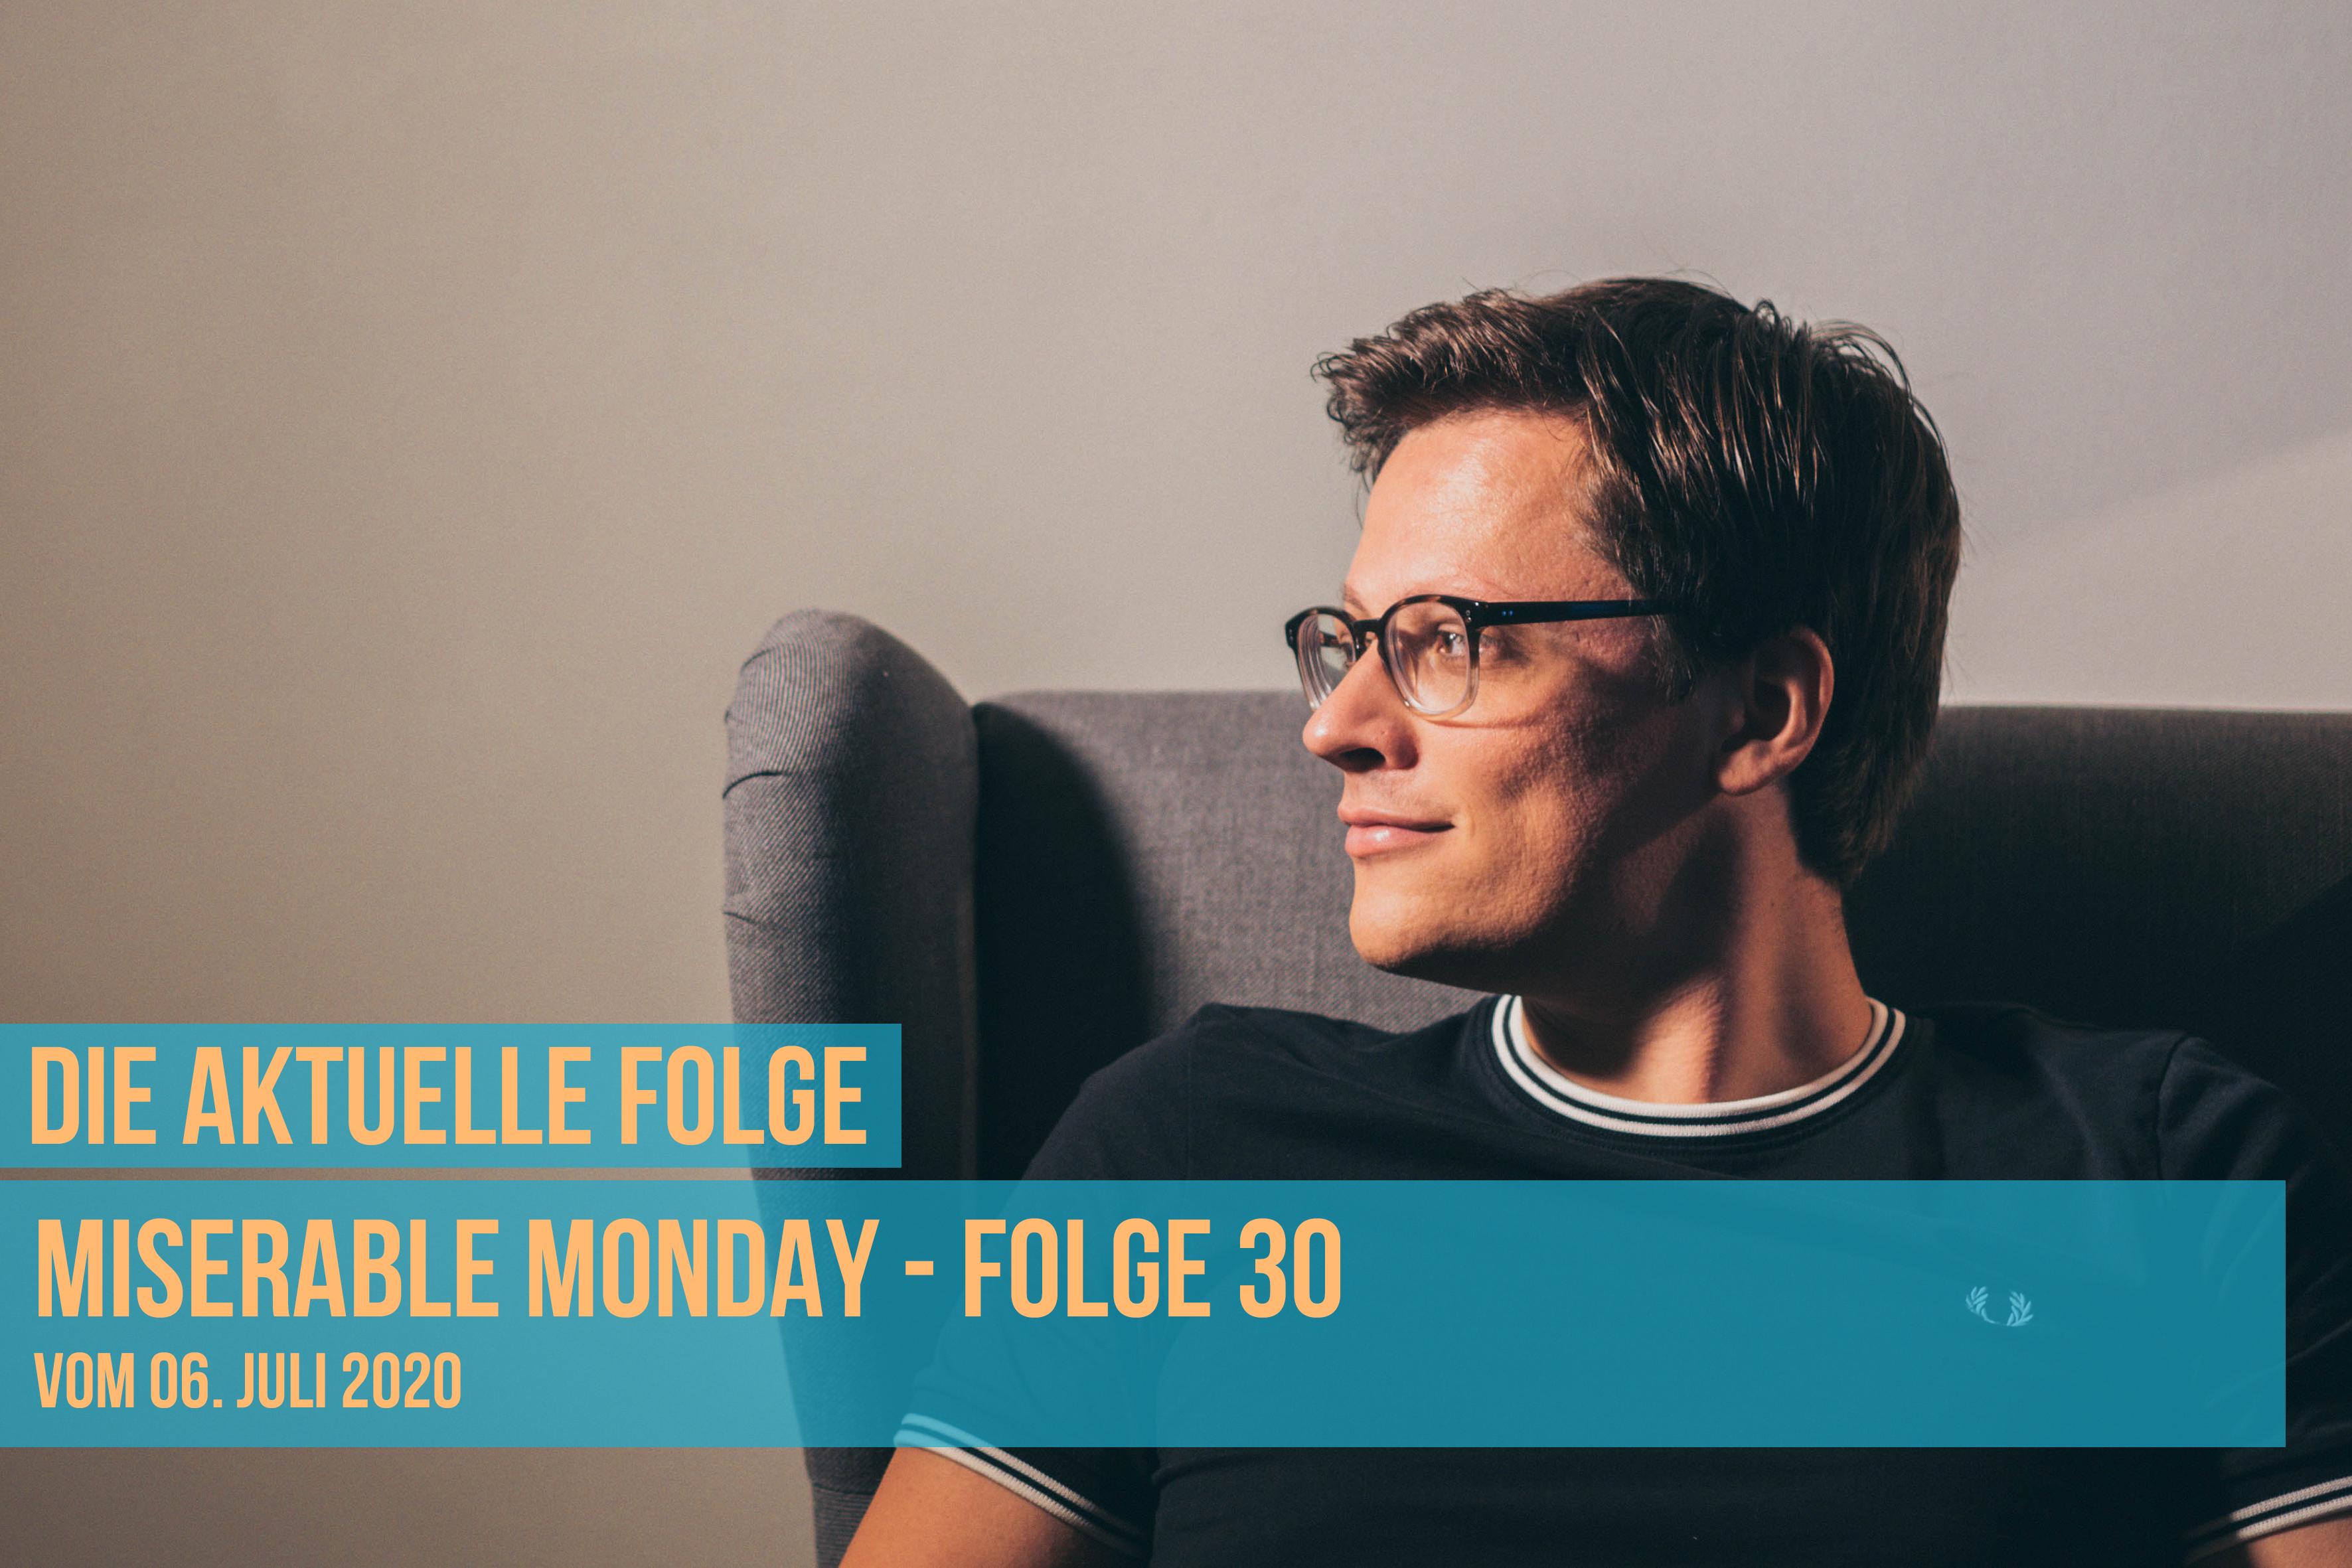 Miserable Monday - Folge 30